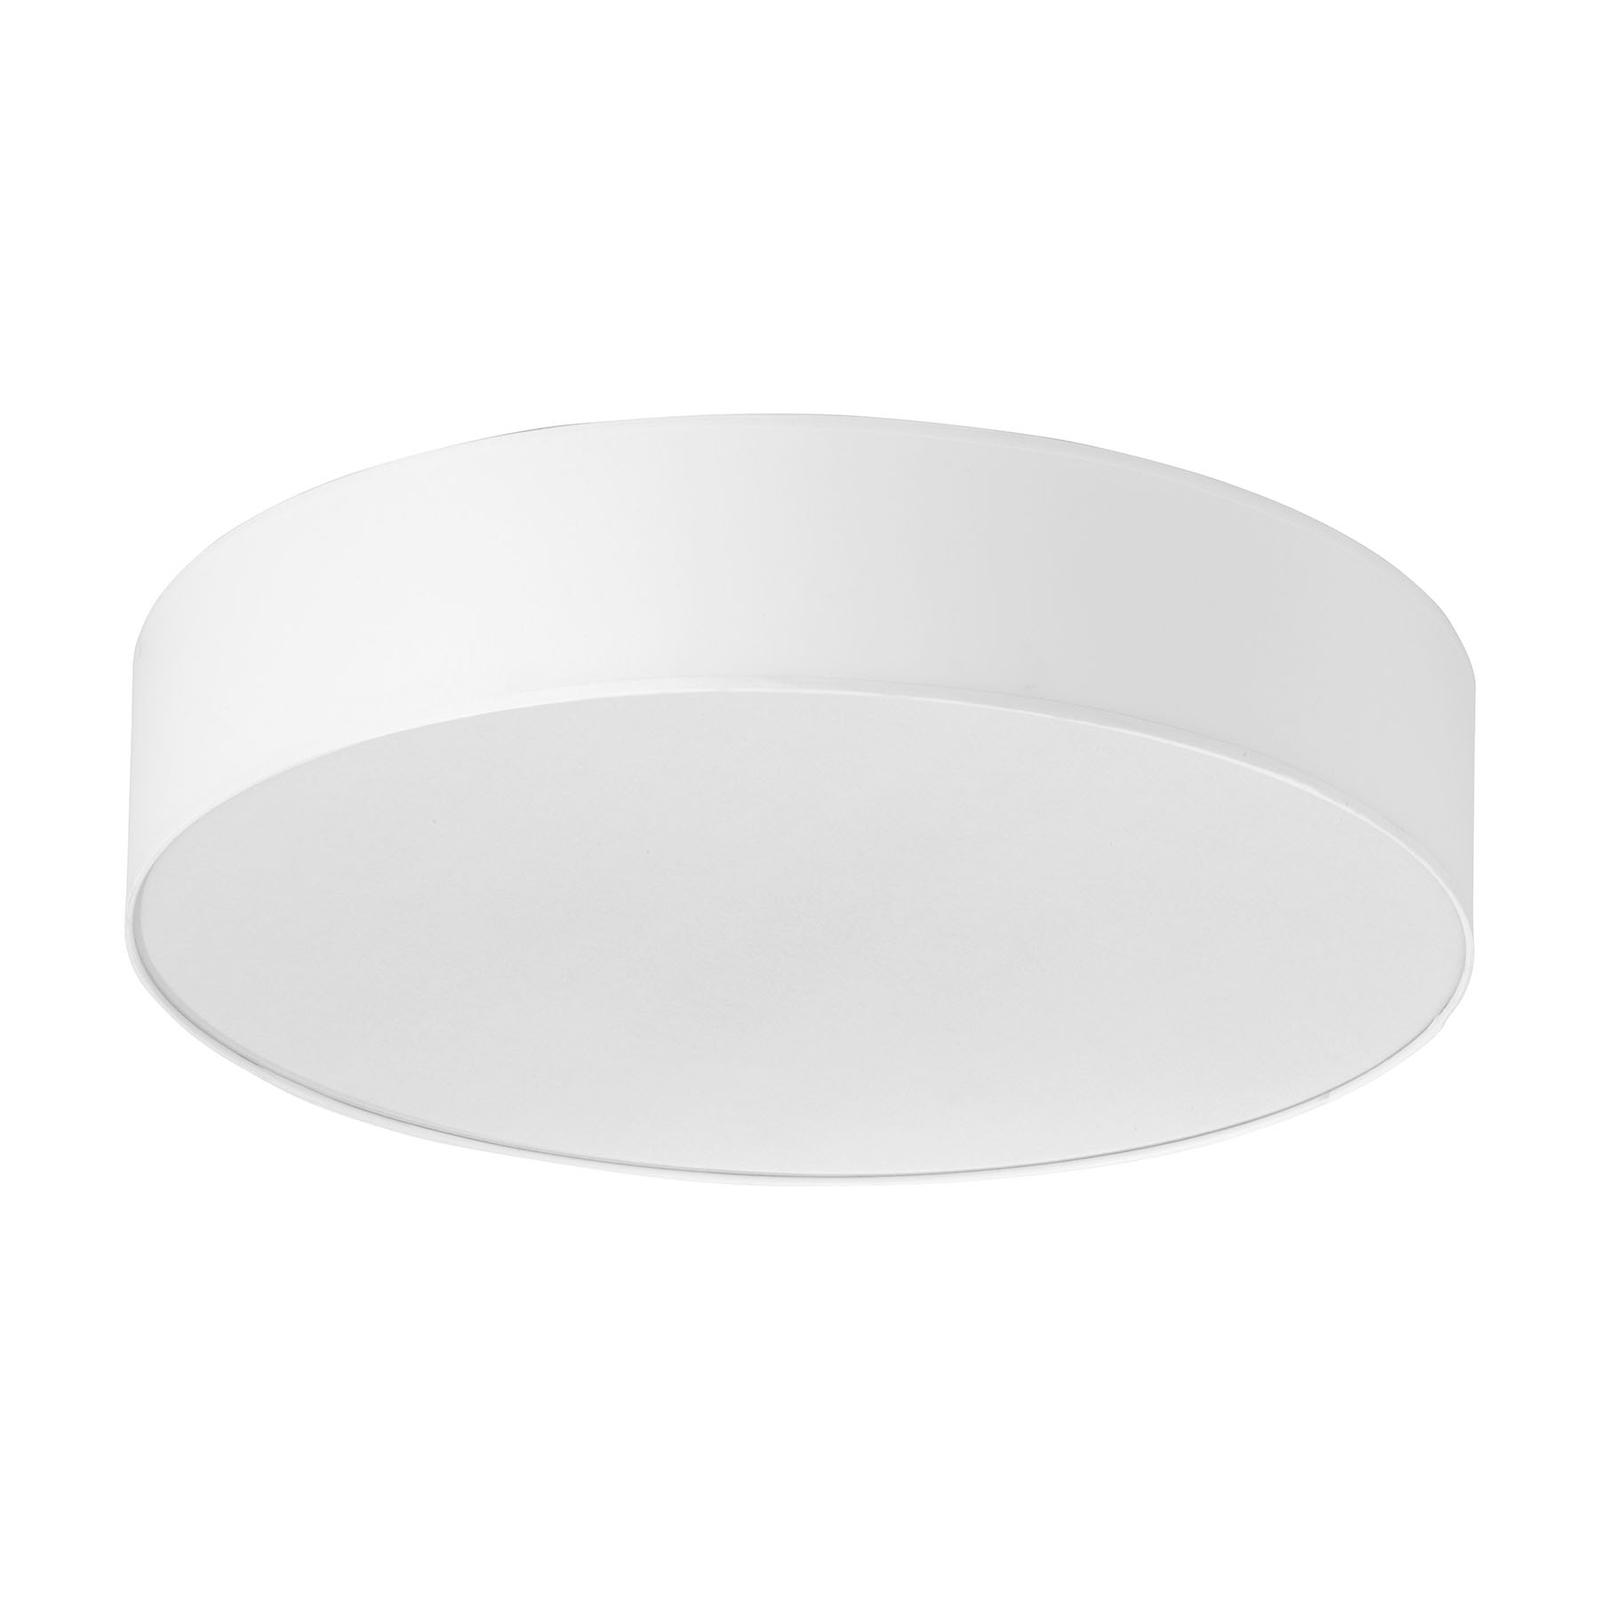 Rondo taklampe, hvit Ø 60 cm